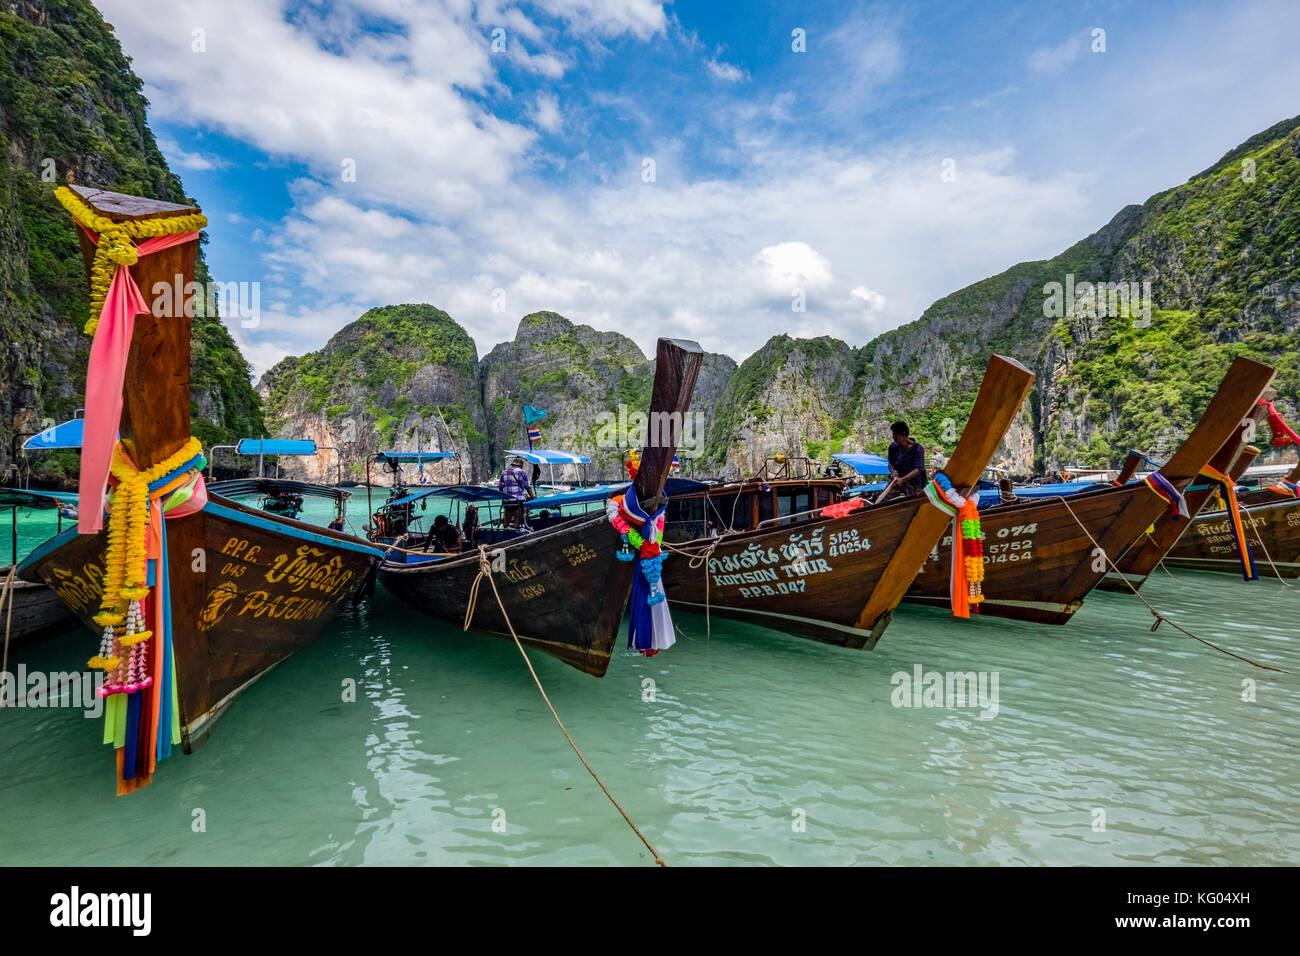 Tailandia. Mar de Andamán. Koh Phi Phi Island. Maya Bay. Botes de cola larga Imagen De Stock